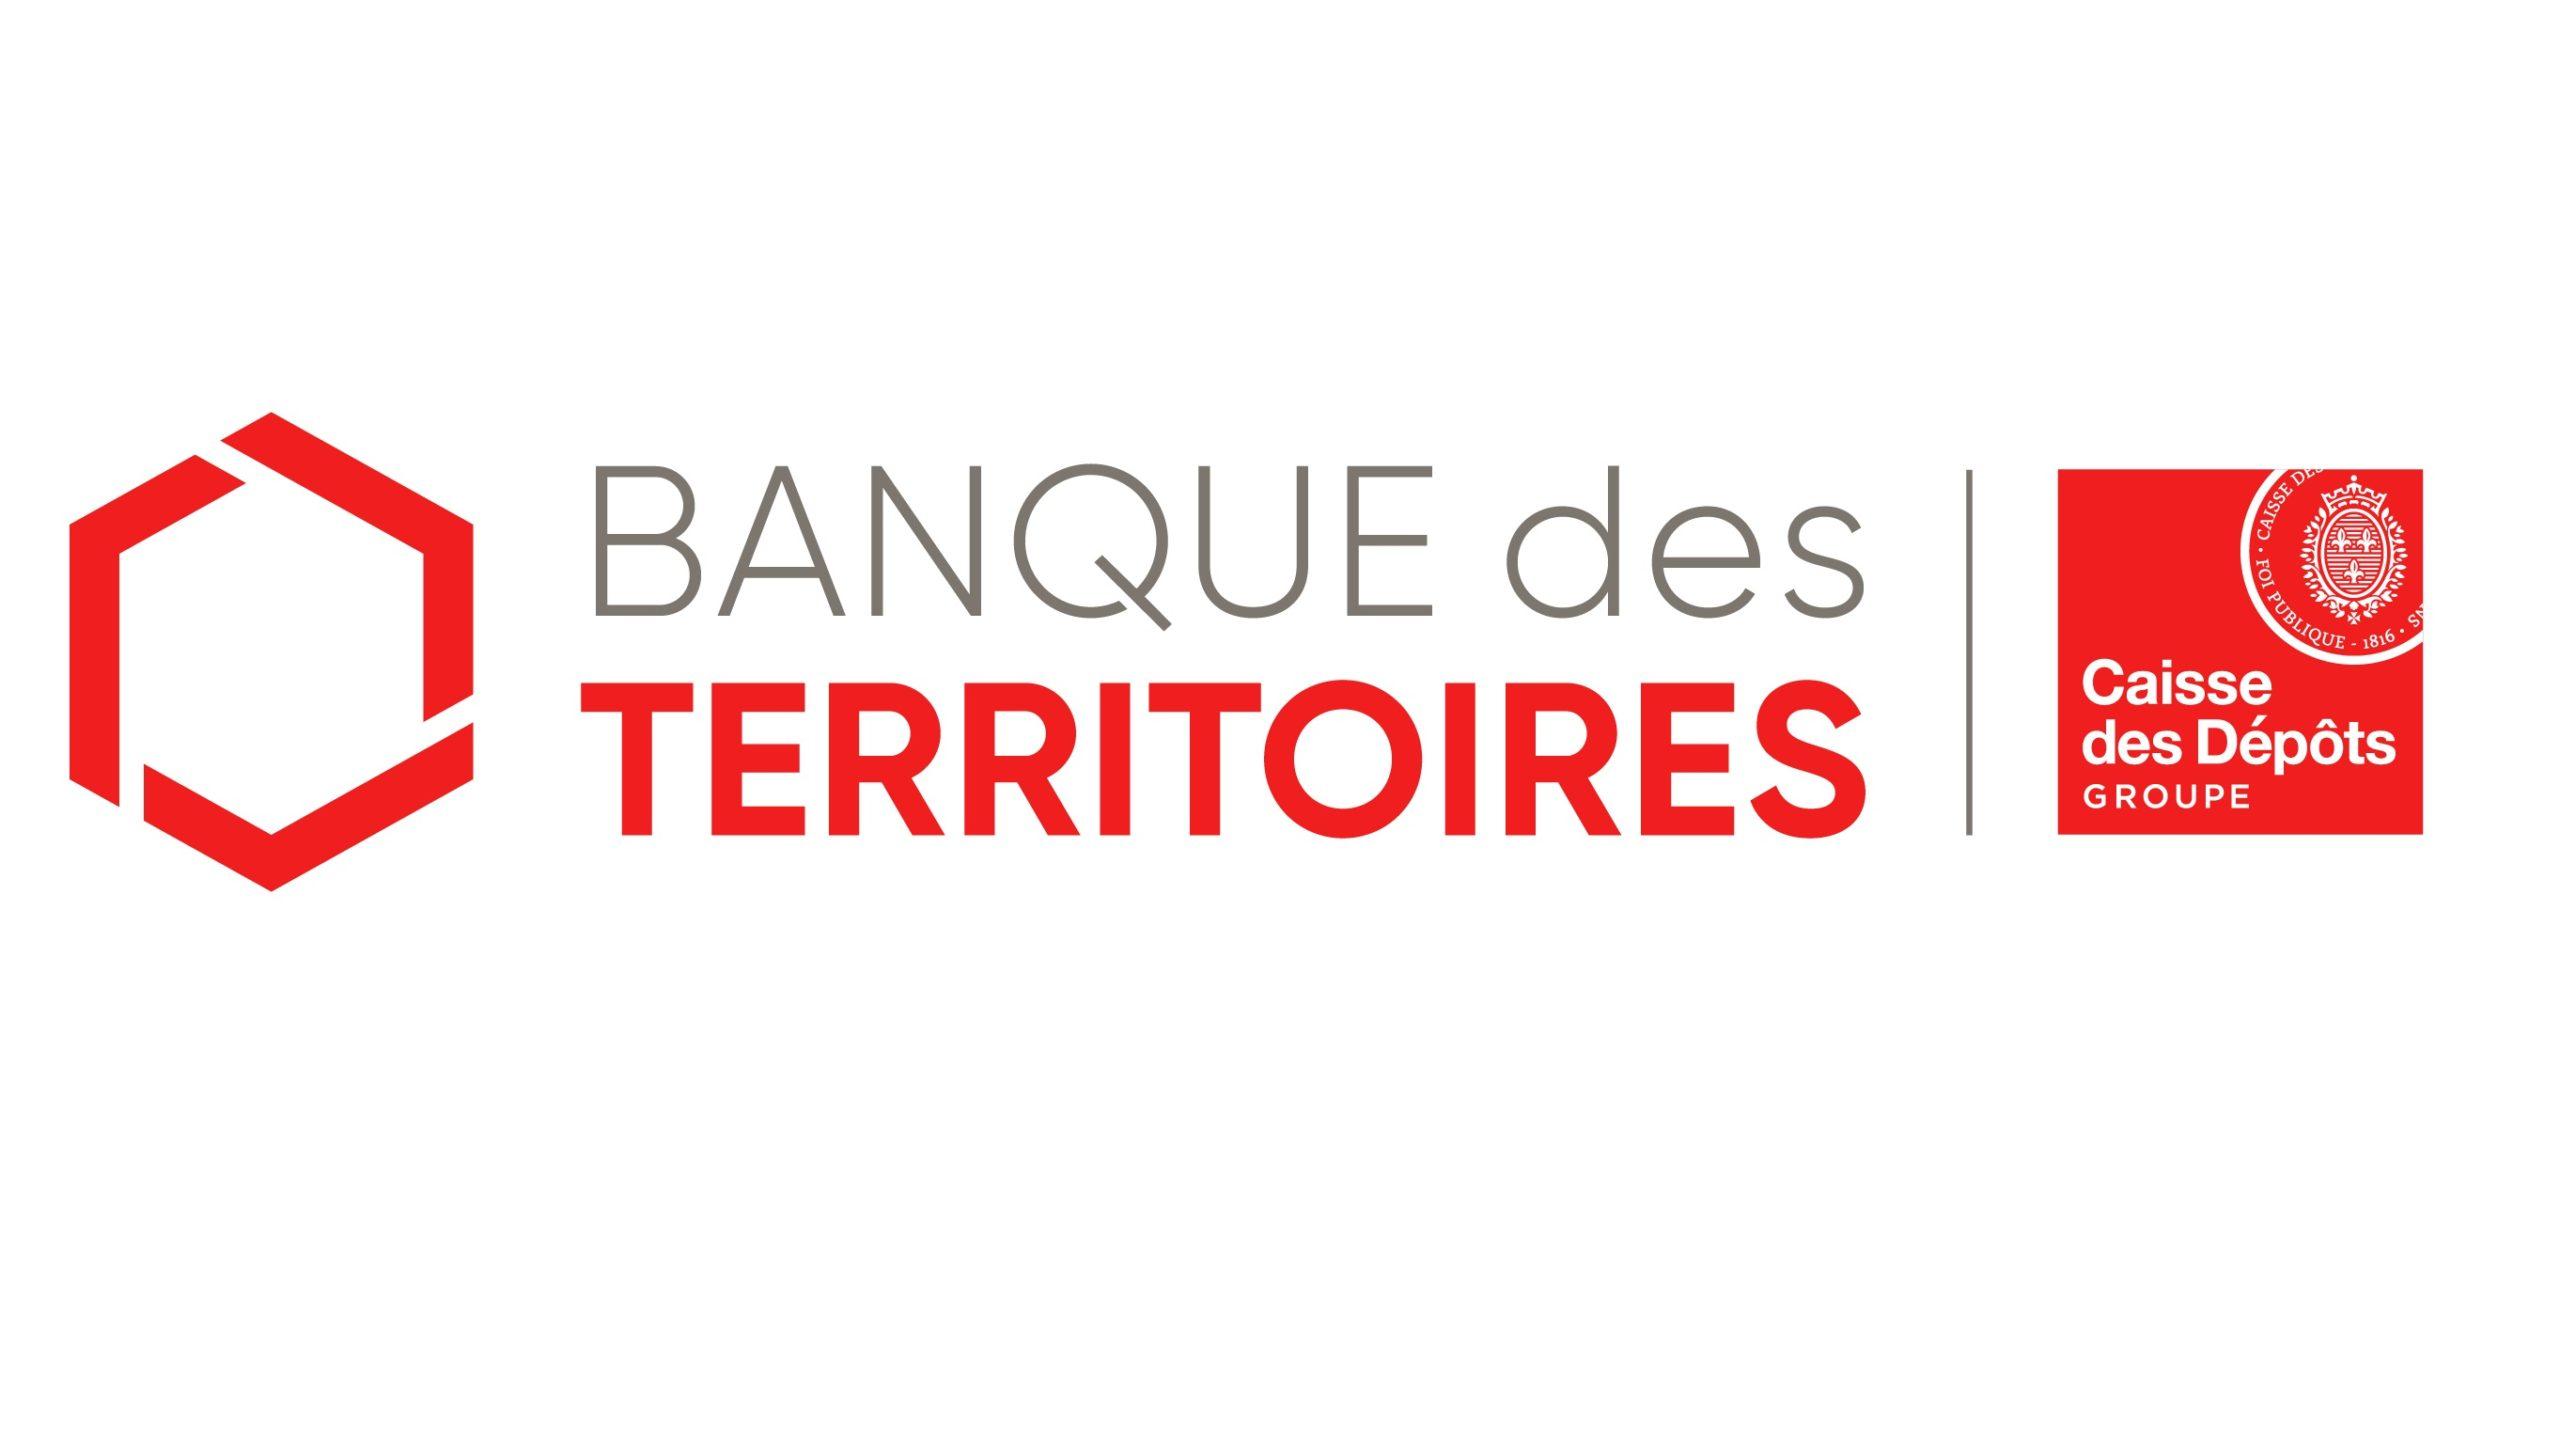 banque territoires logo endos bm horizontal pos rvb 2 scaled